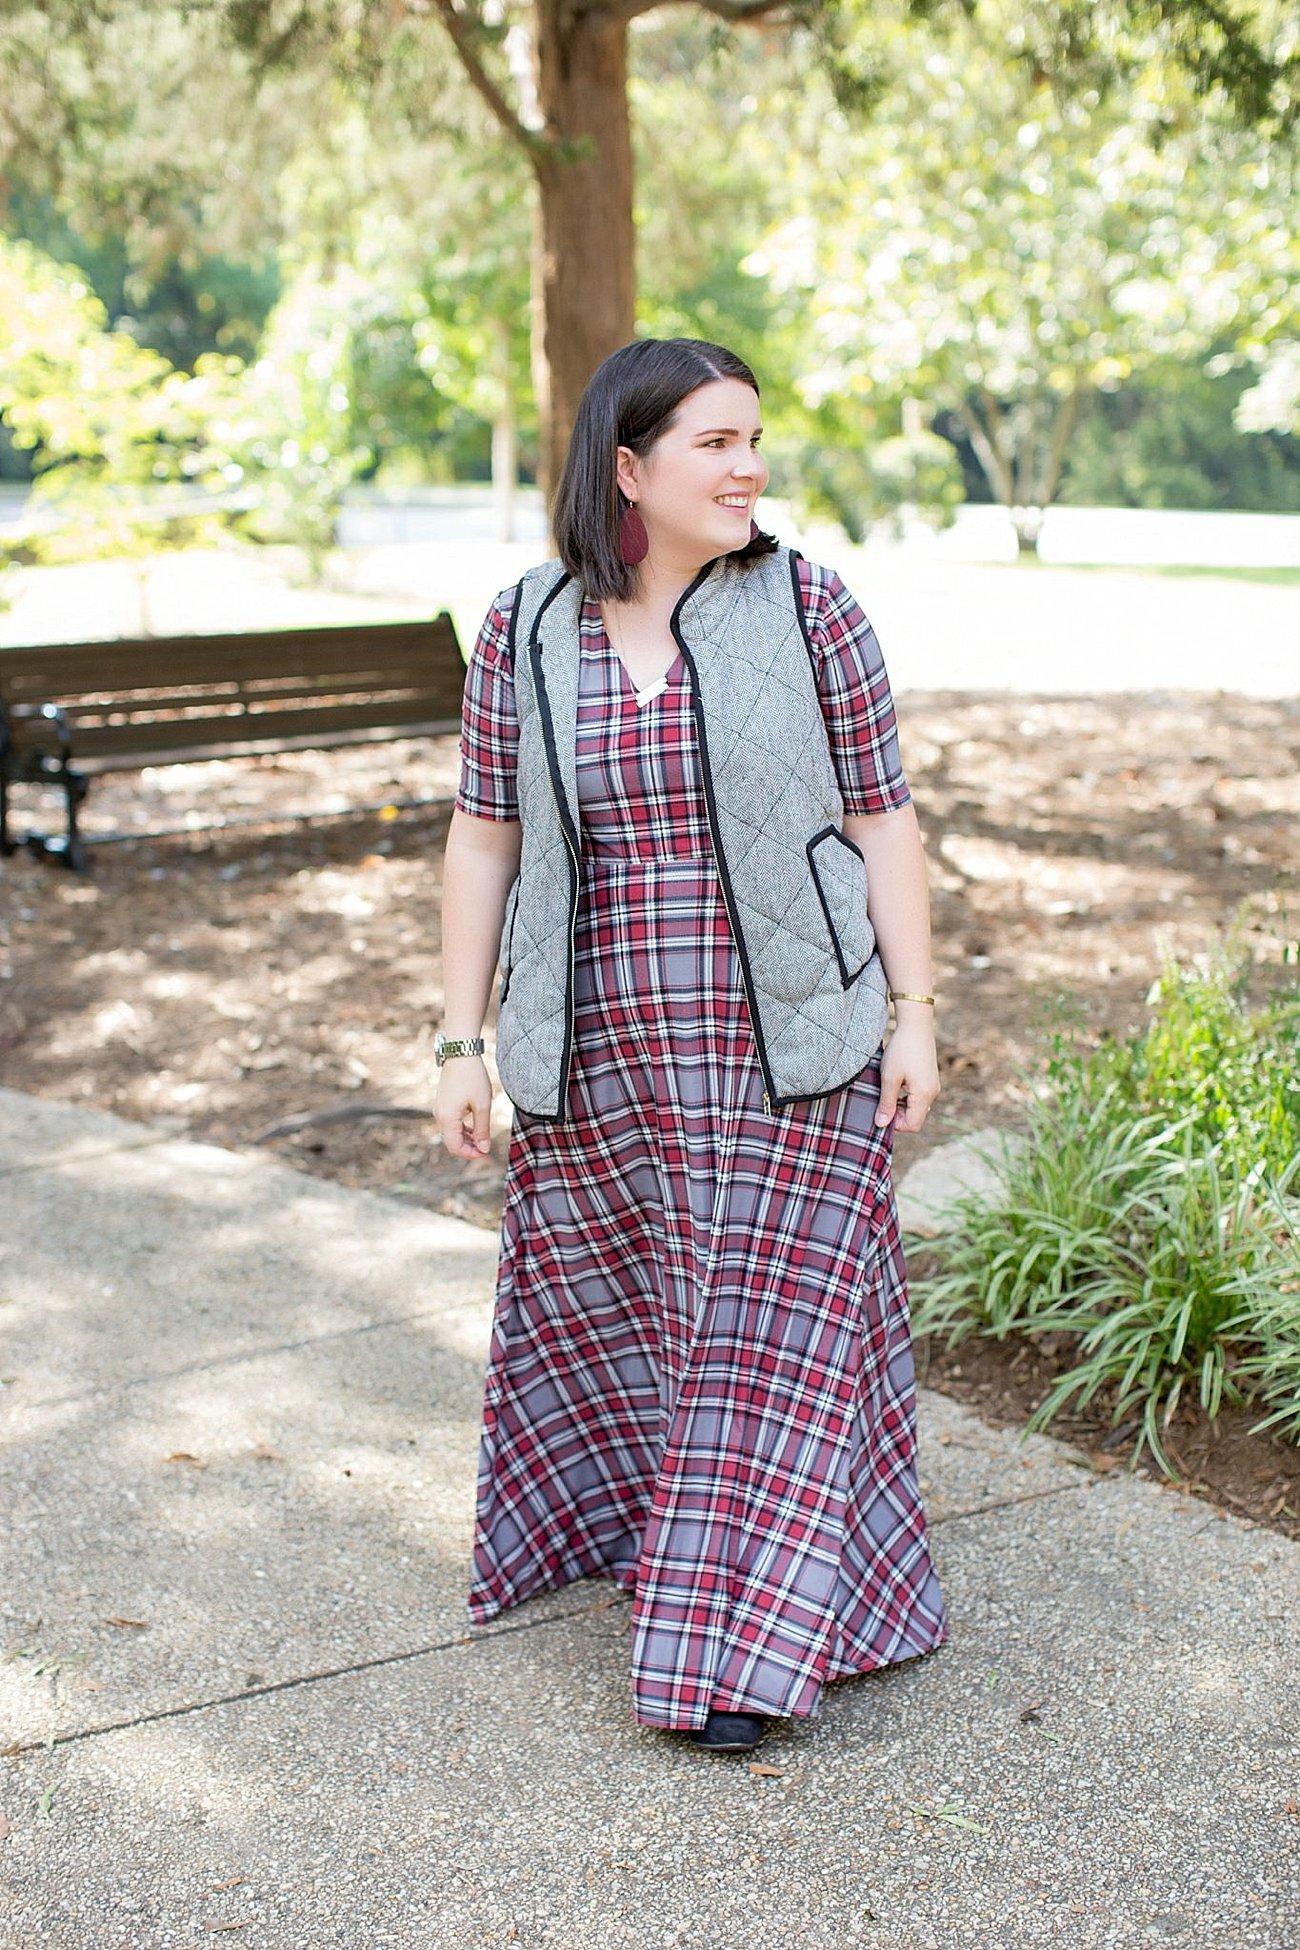 Agnes & Dora plaid Austen dress, herringbone vest, fall fashion, ethical fall fashion | North Carolina life and style blogger (8)